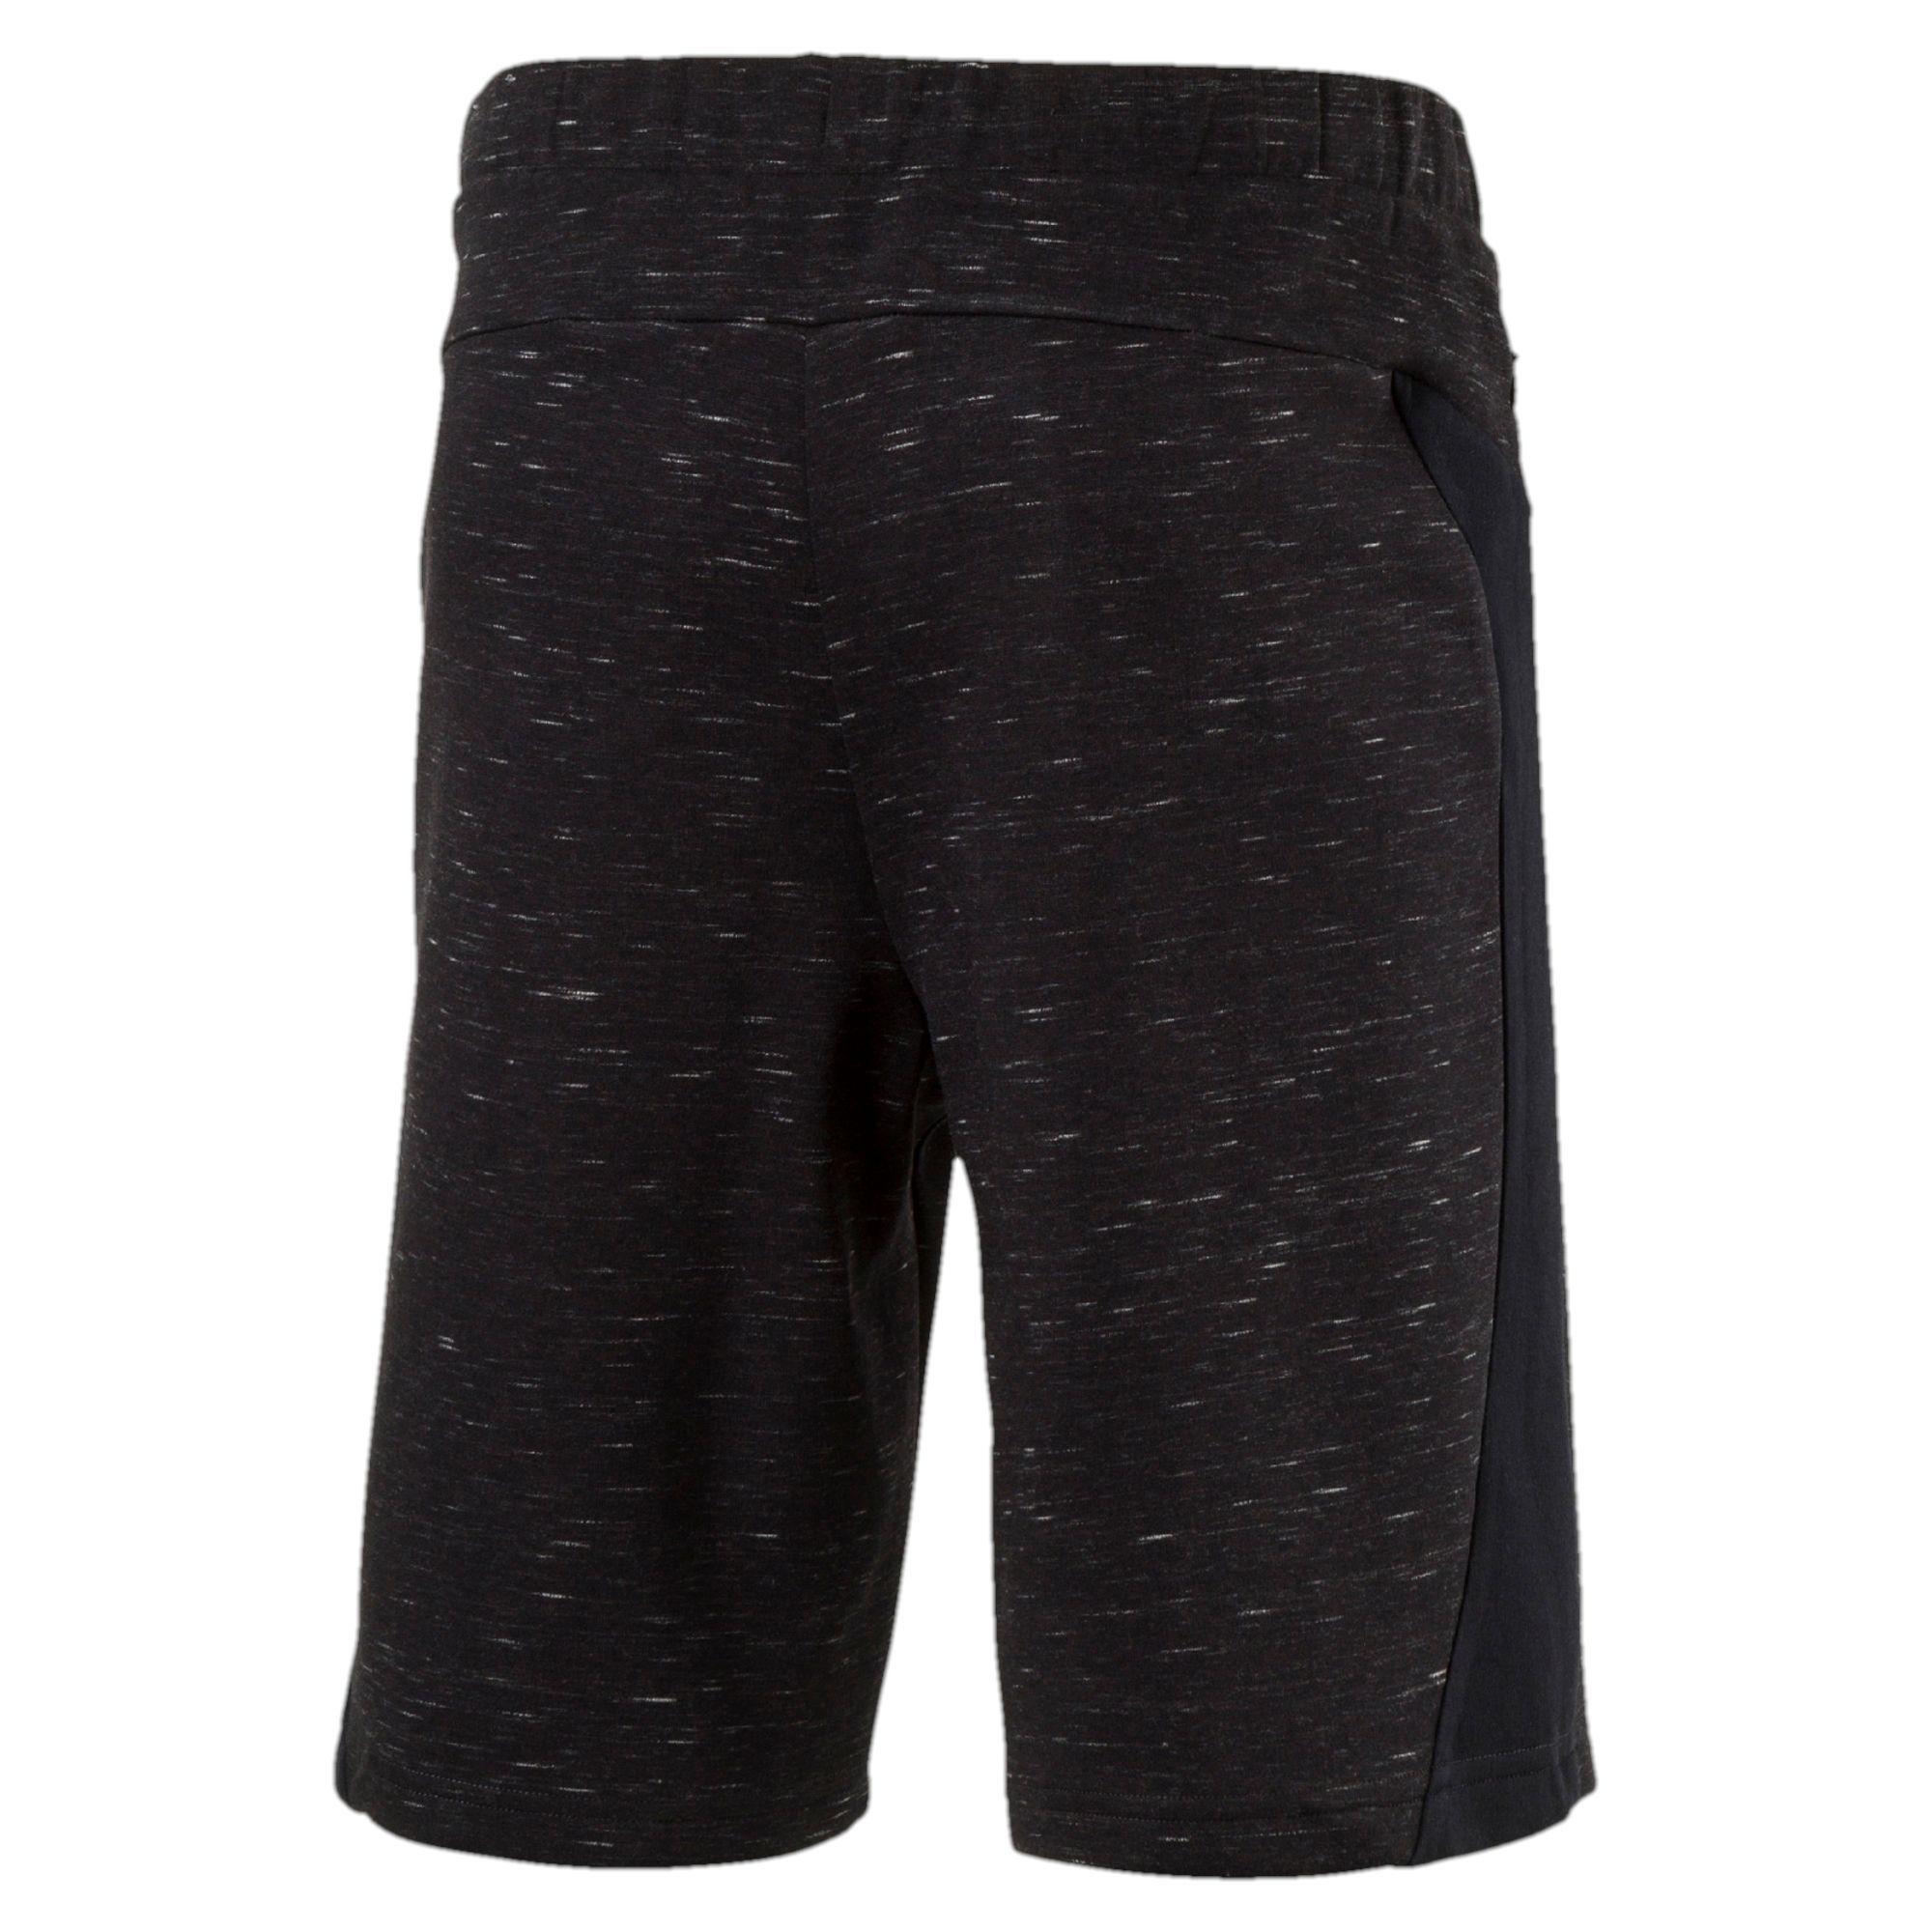 4d82f5a7b9dd Lyst - PUMA Evostripe Spaceknit Shorts in Black for Men